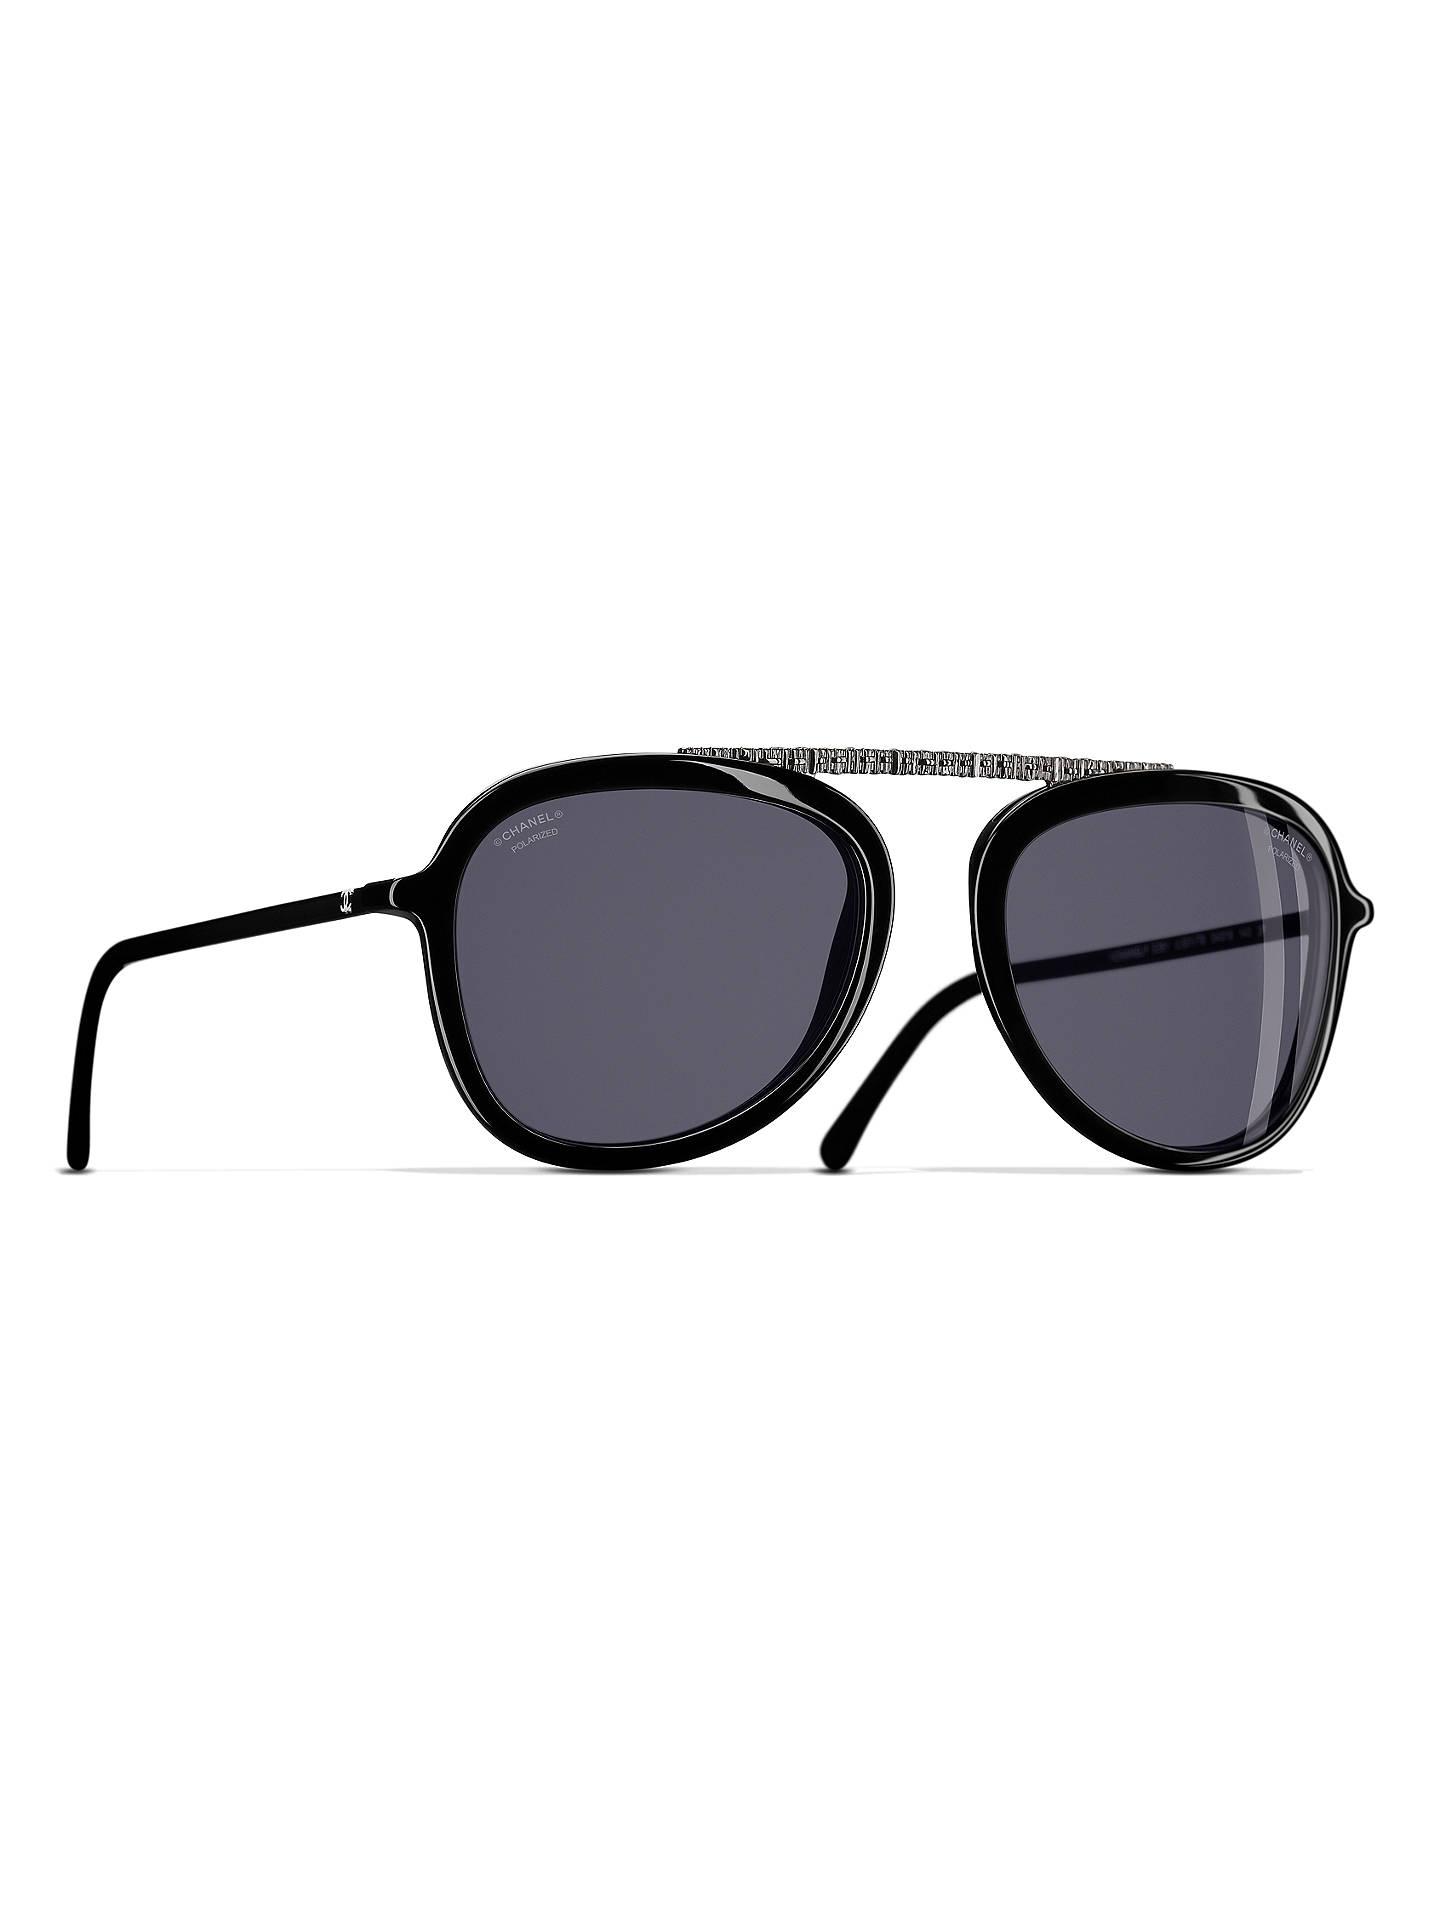 BuyCHANEL Polarised Pilot Sunglasses CH5381 Black Online at johnlewis.com  ... 80d2941b5d5